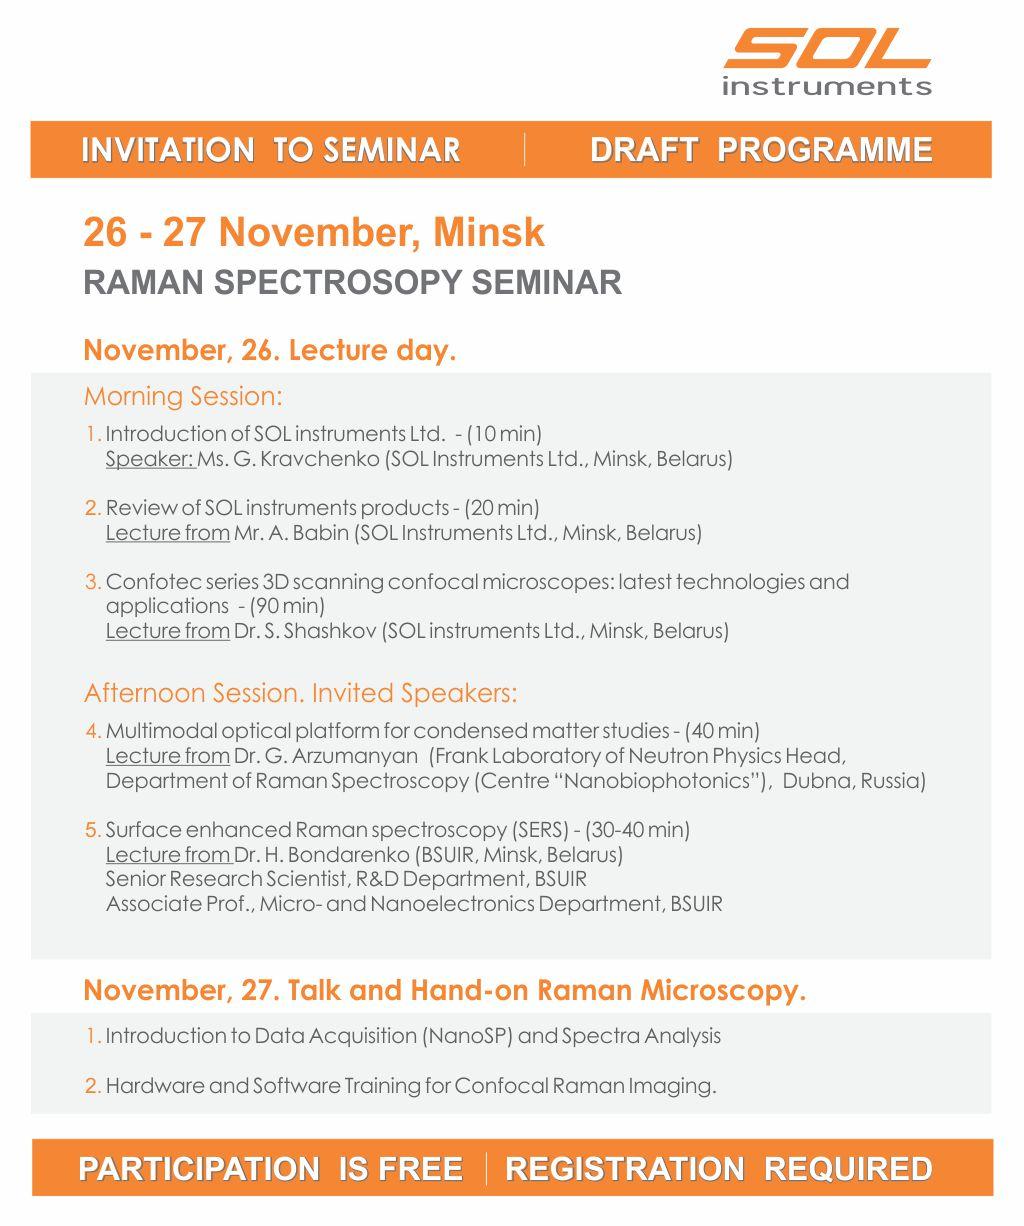 Программа семинара Рамановская спектроскопия 2015